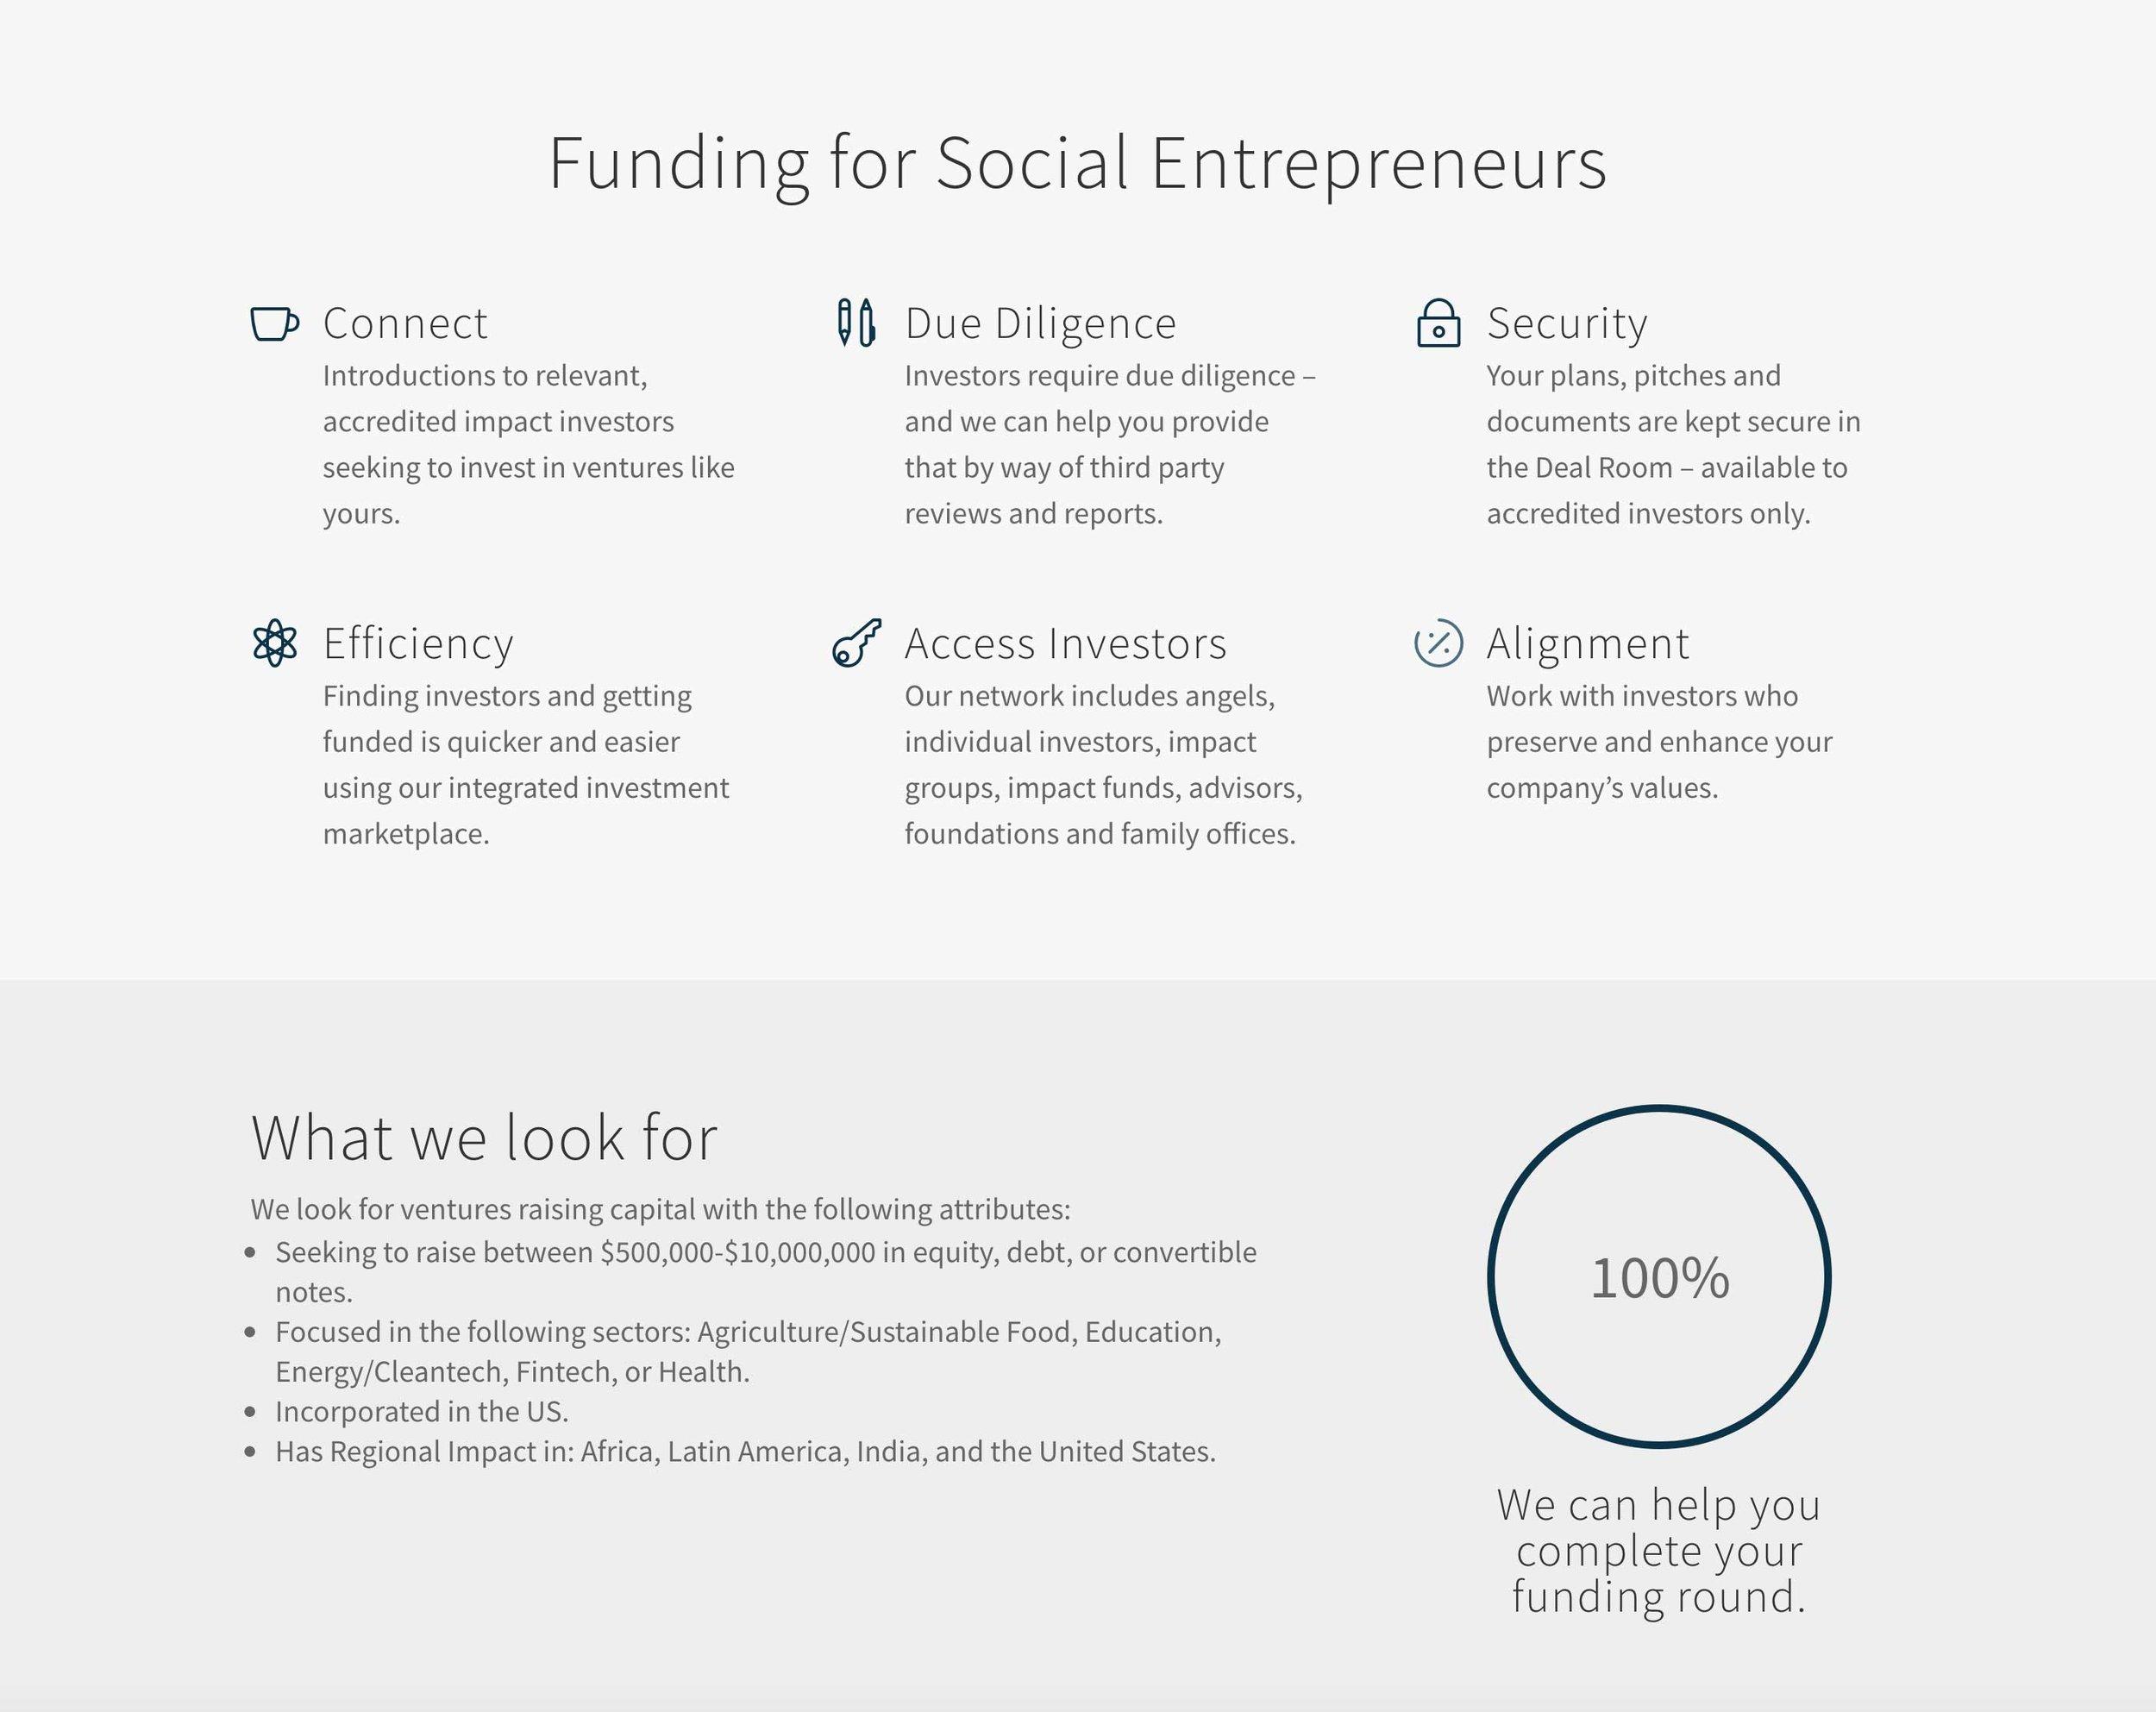 social-venture-benefits.jpg